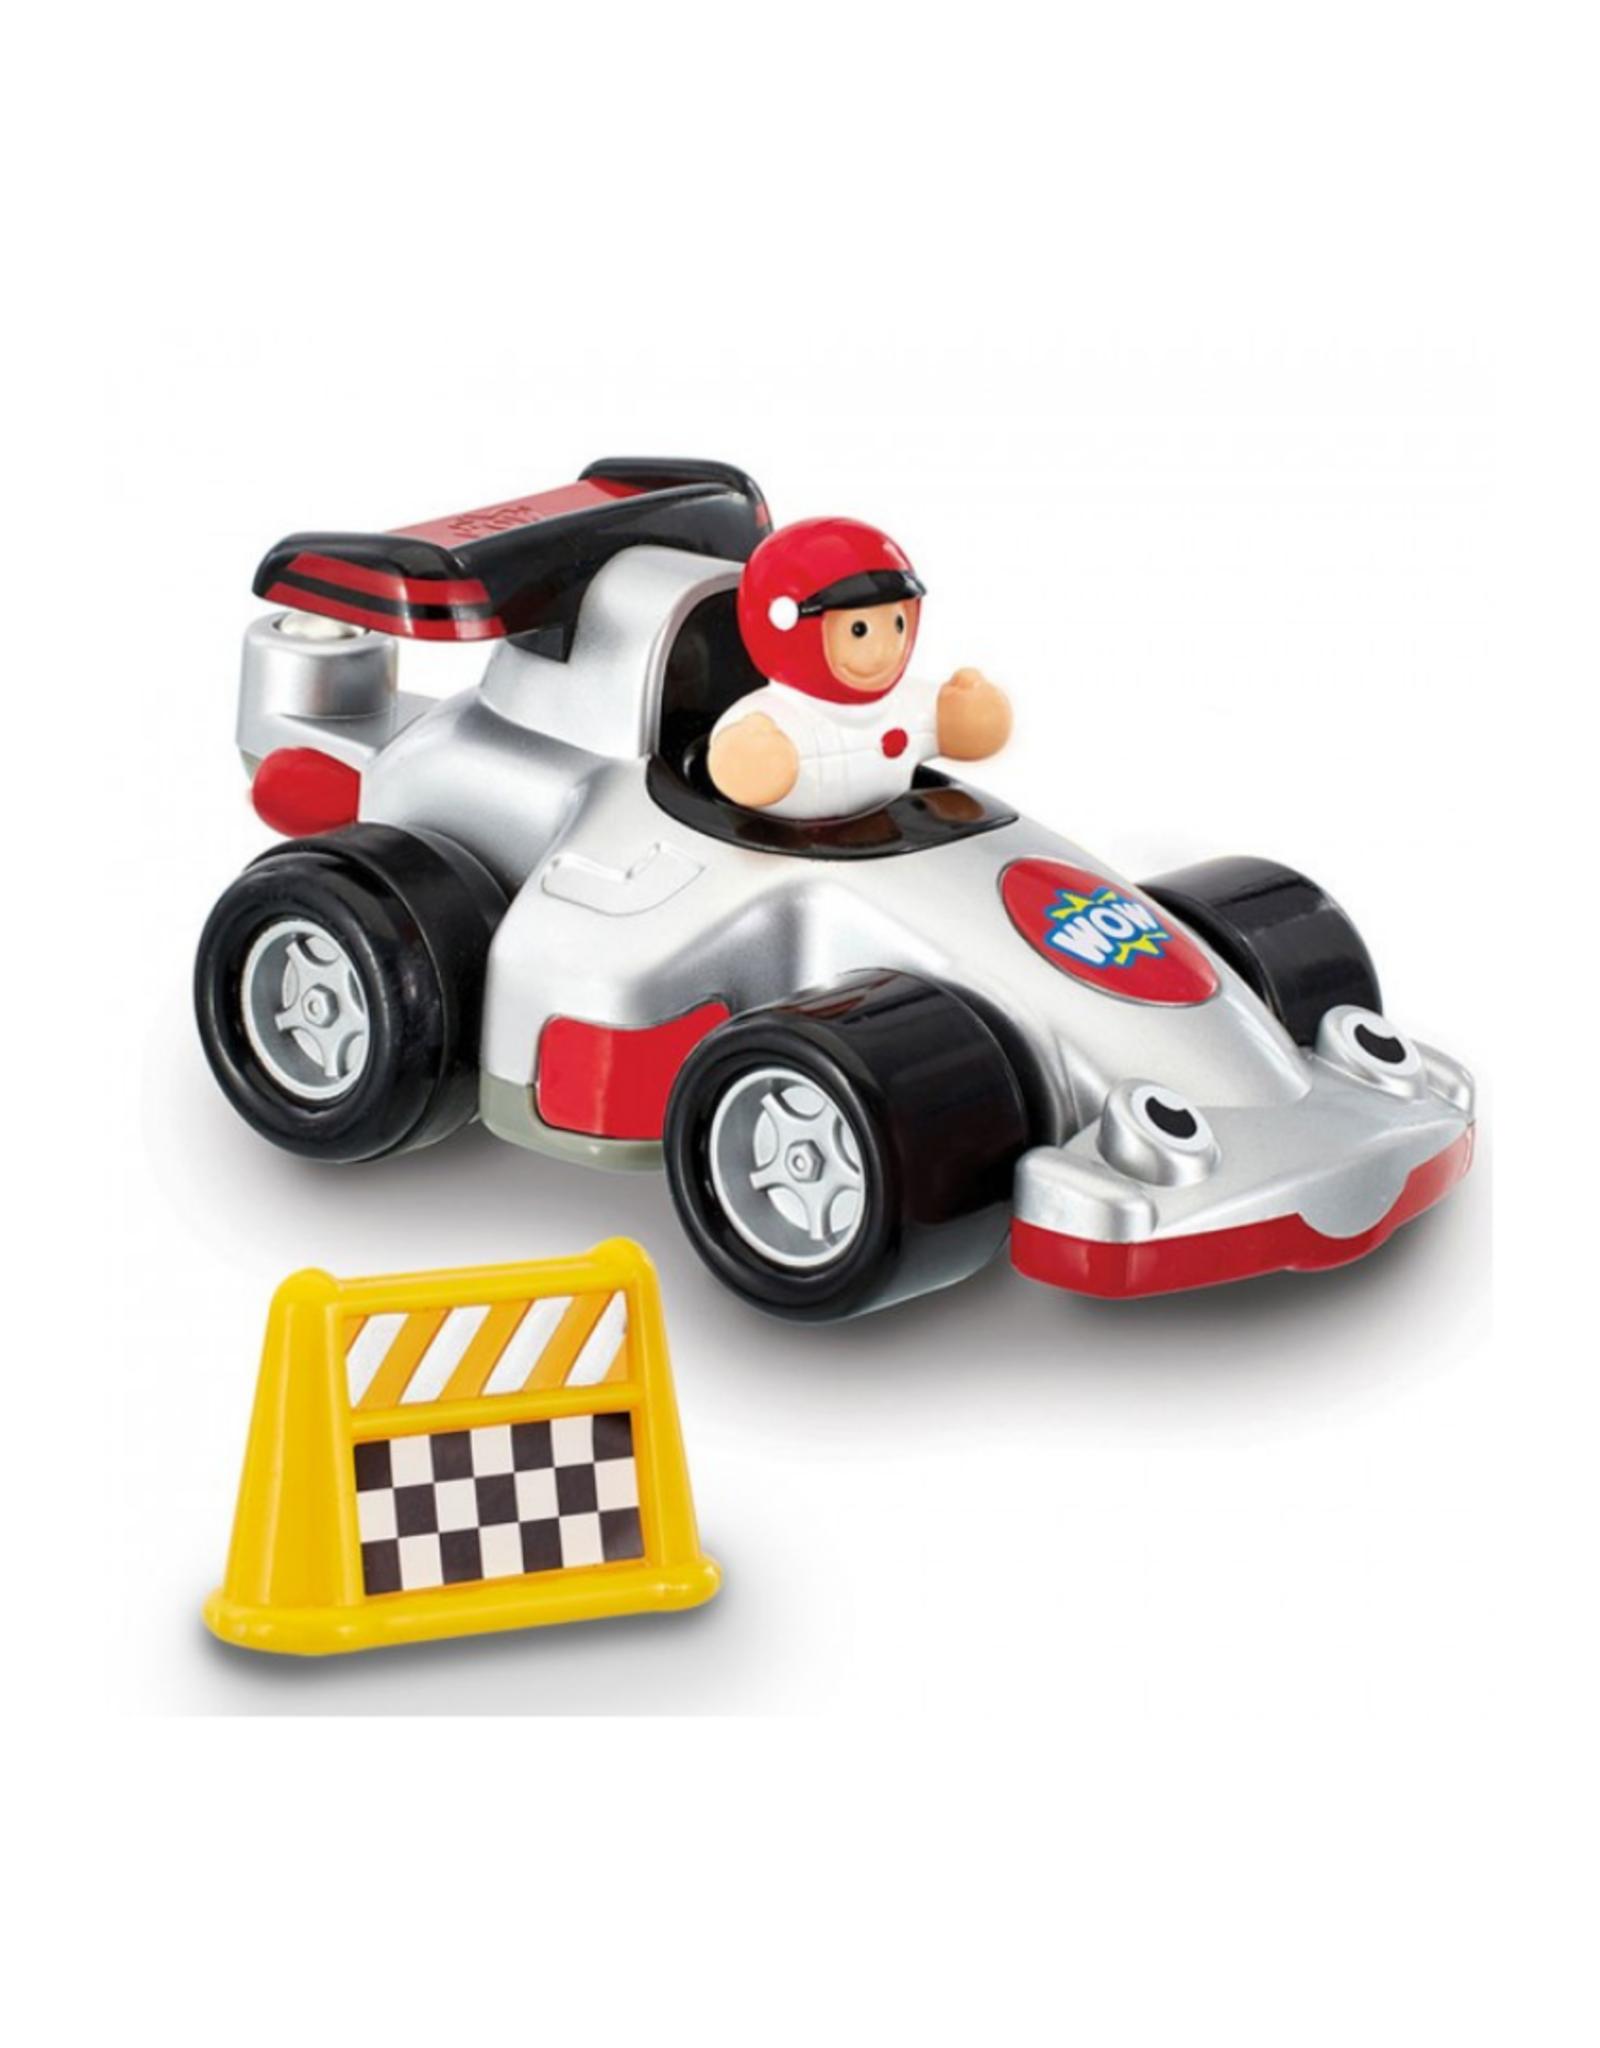 WOW Toys WOW Toys - Richie Race Car